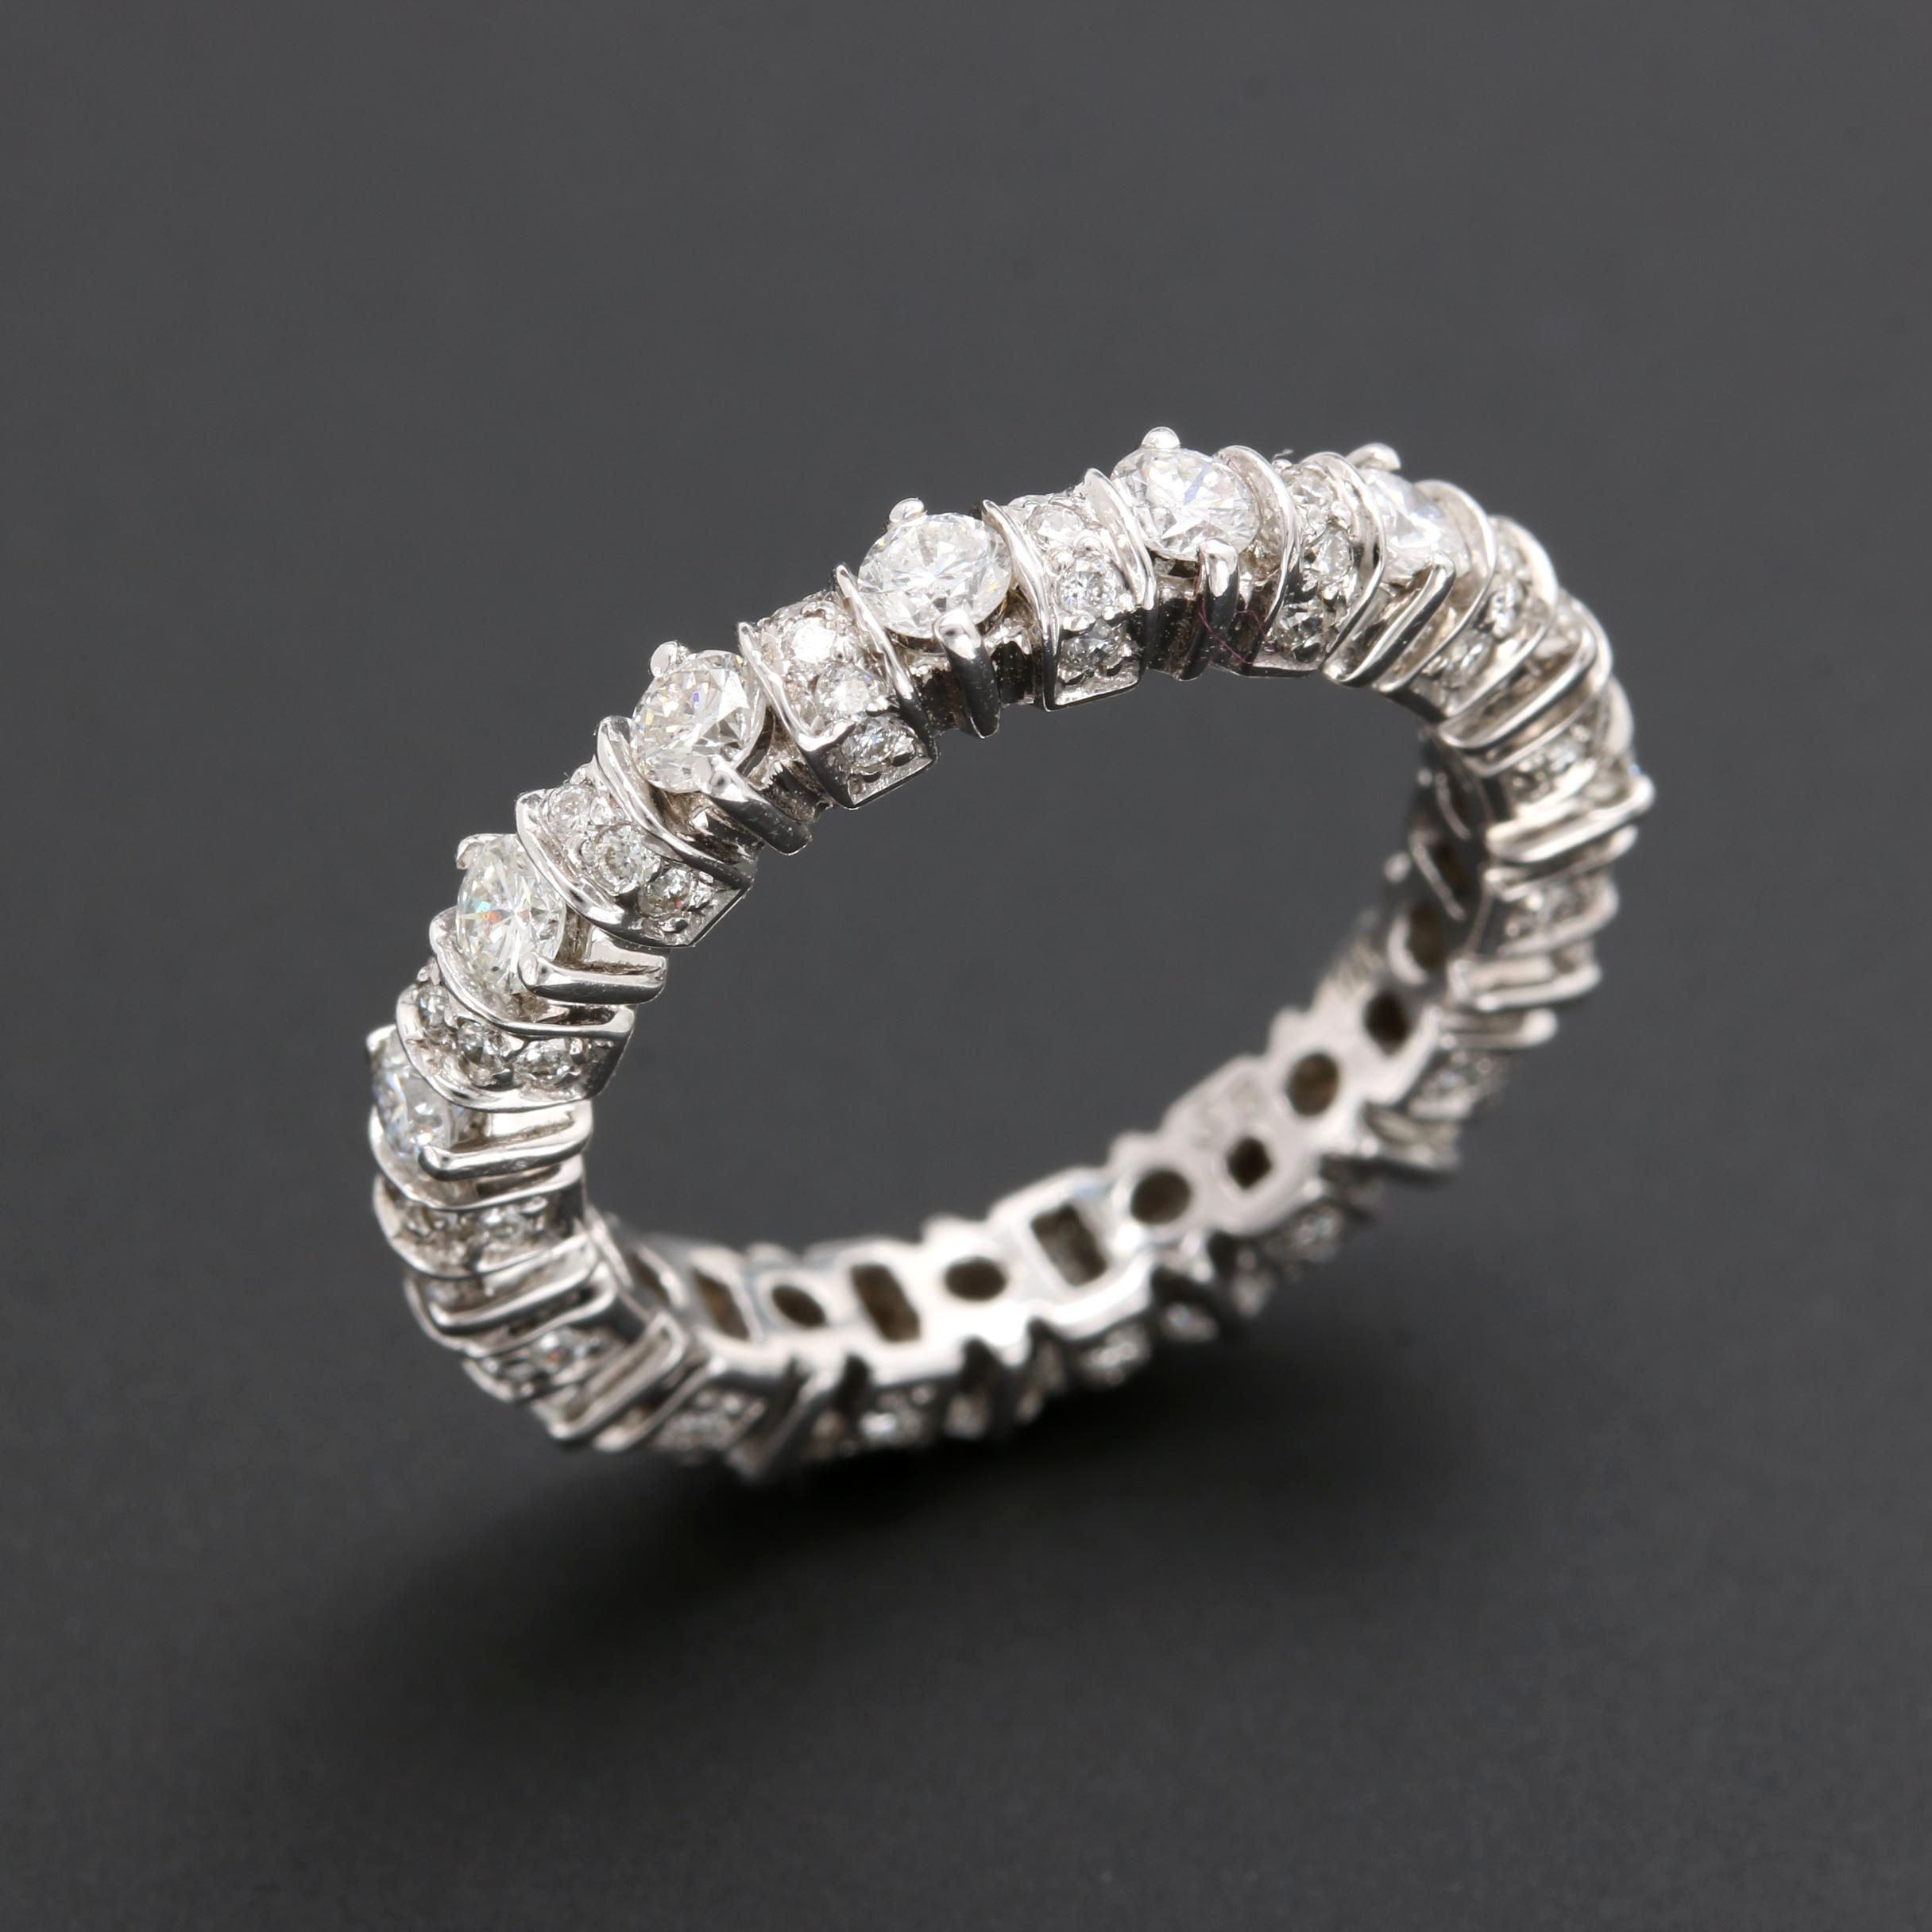 14K White Gold 1.27 CTW Diamond Eternity Ring